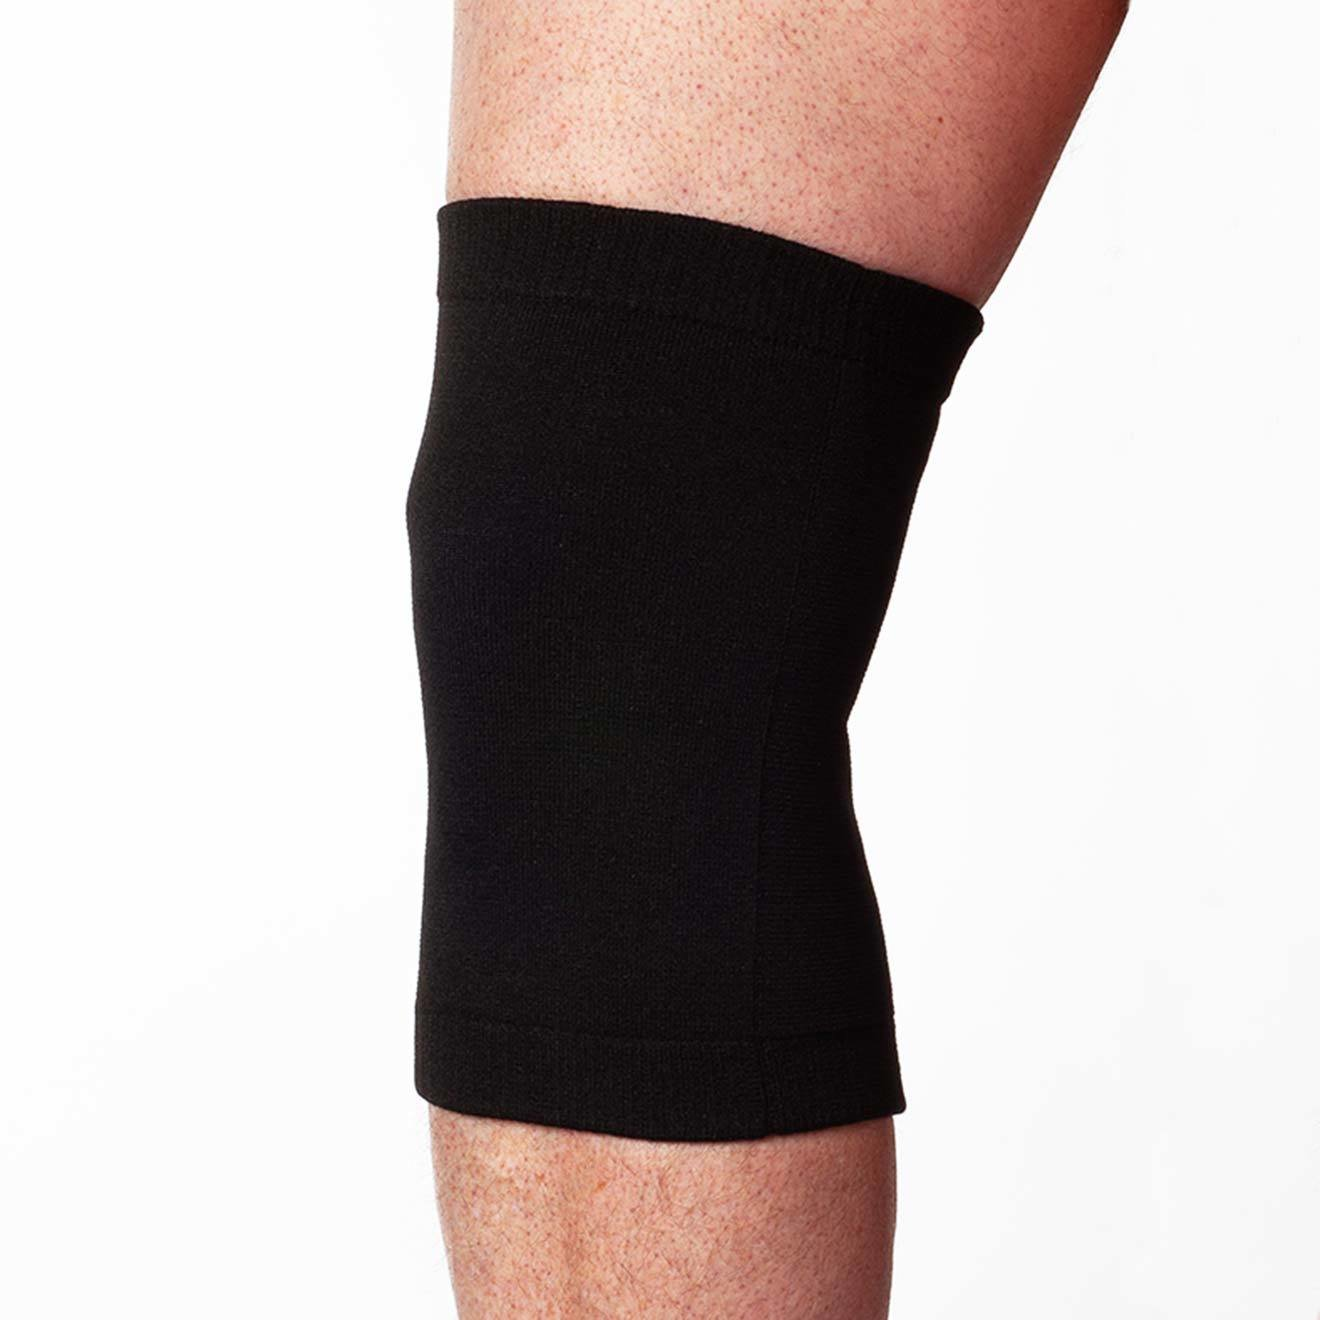 Knee Sleeve - Medium Weight. Knee protection for seniors. UPF 50+ Sun Protection (Single Sleeve)